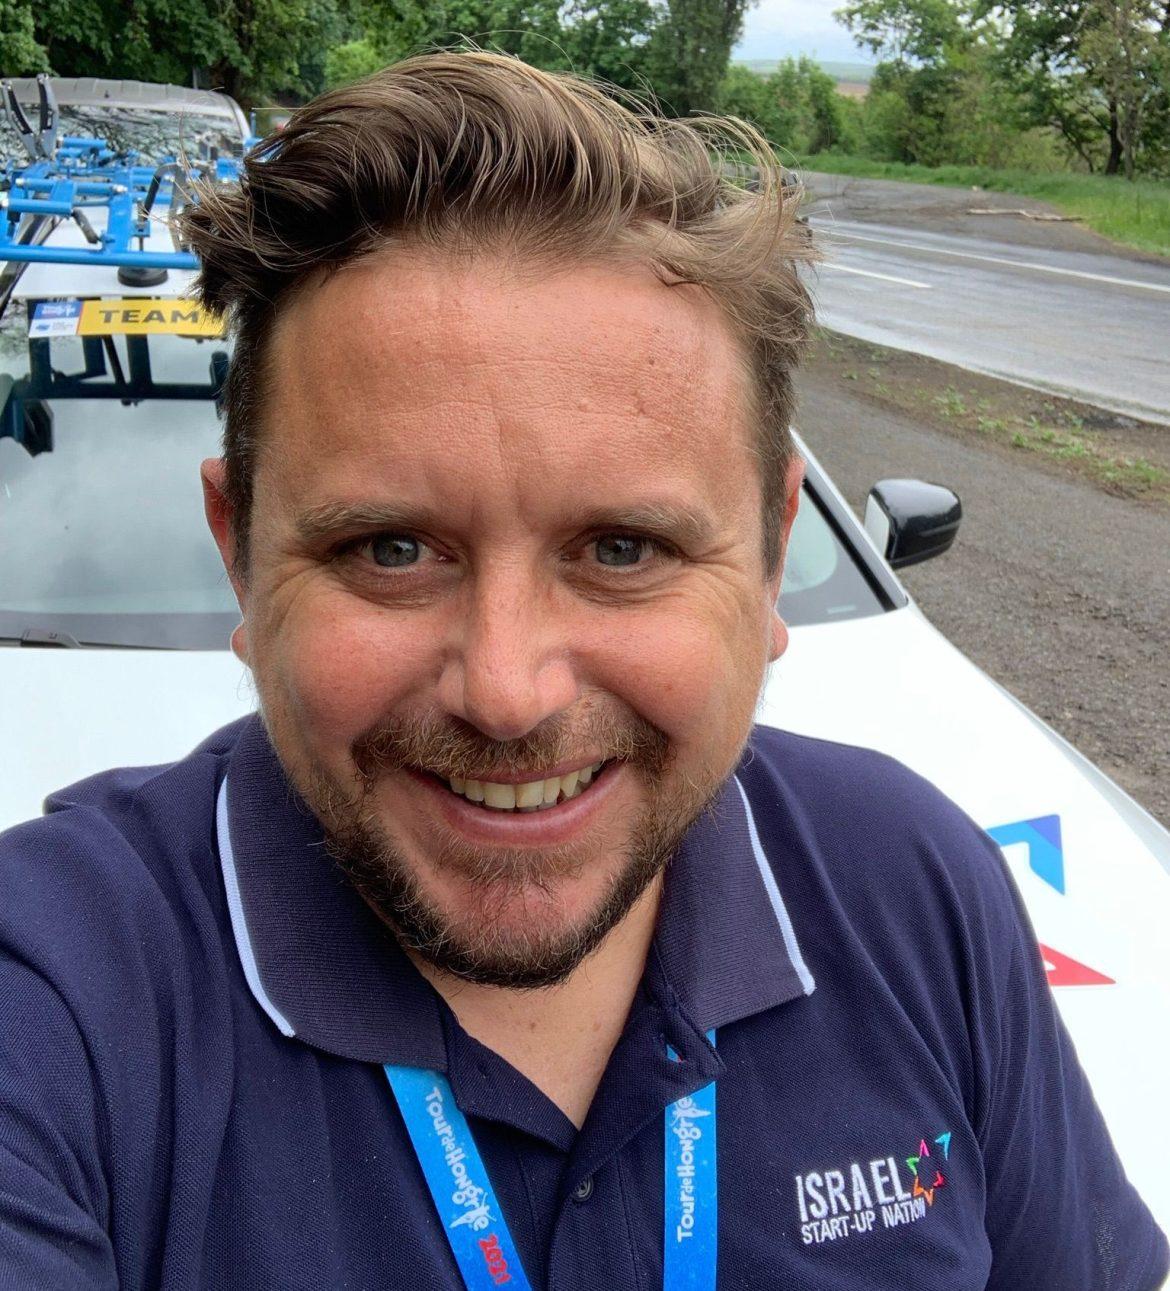 Allan Davis becomes sports director at Lotto Soudal